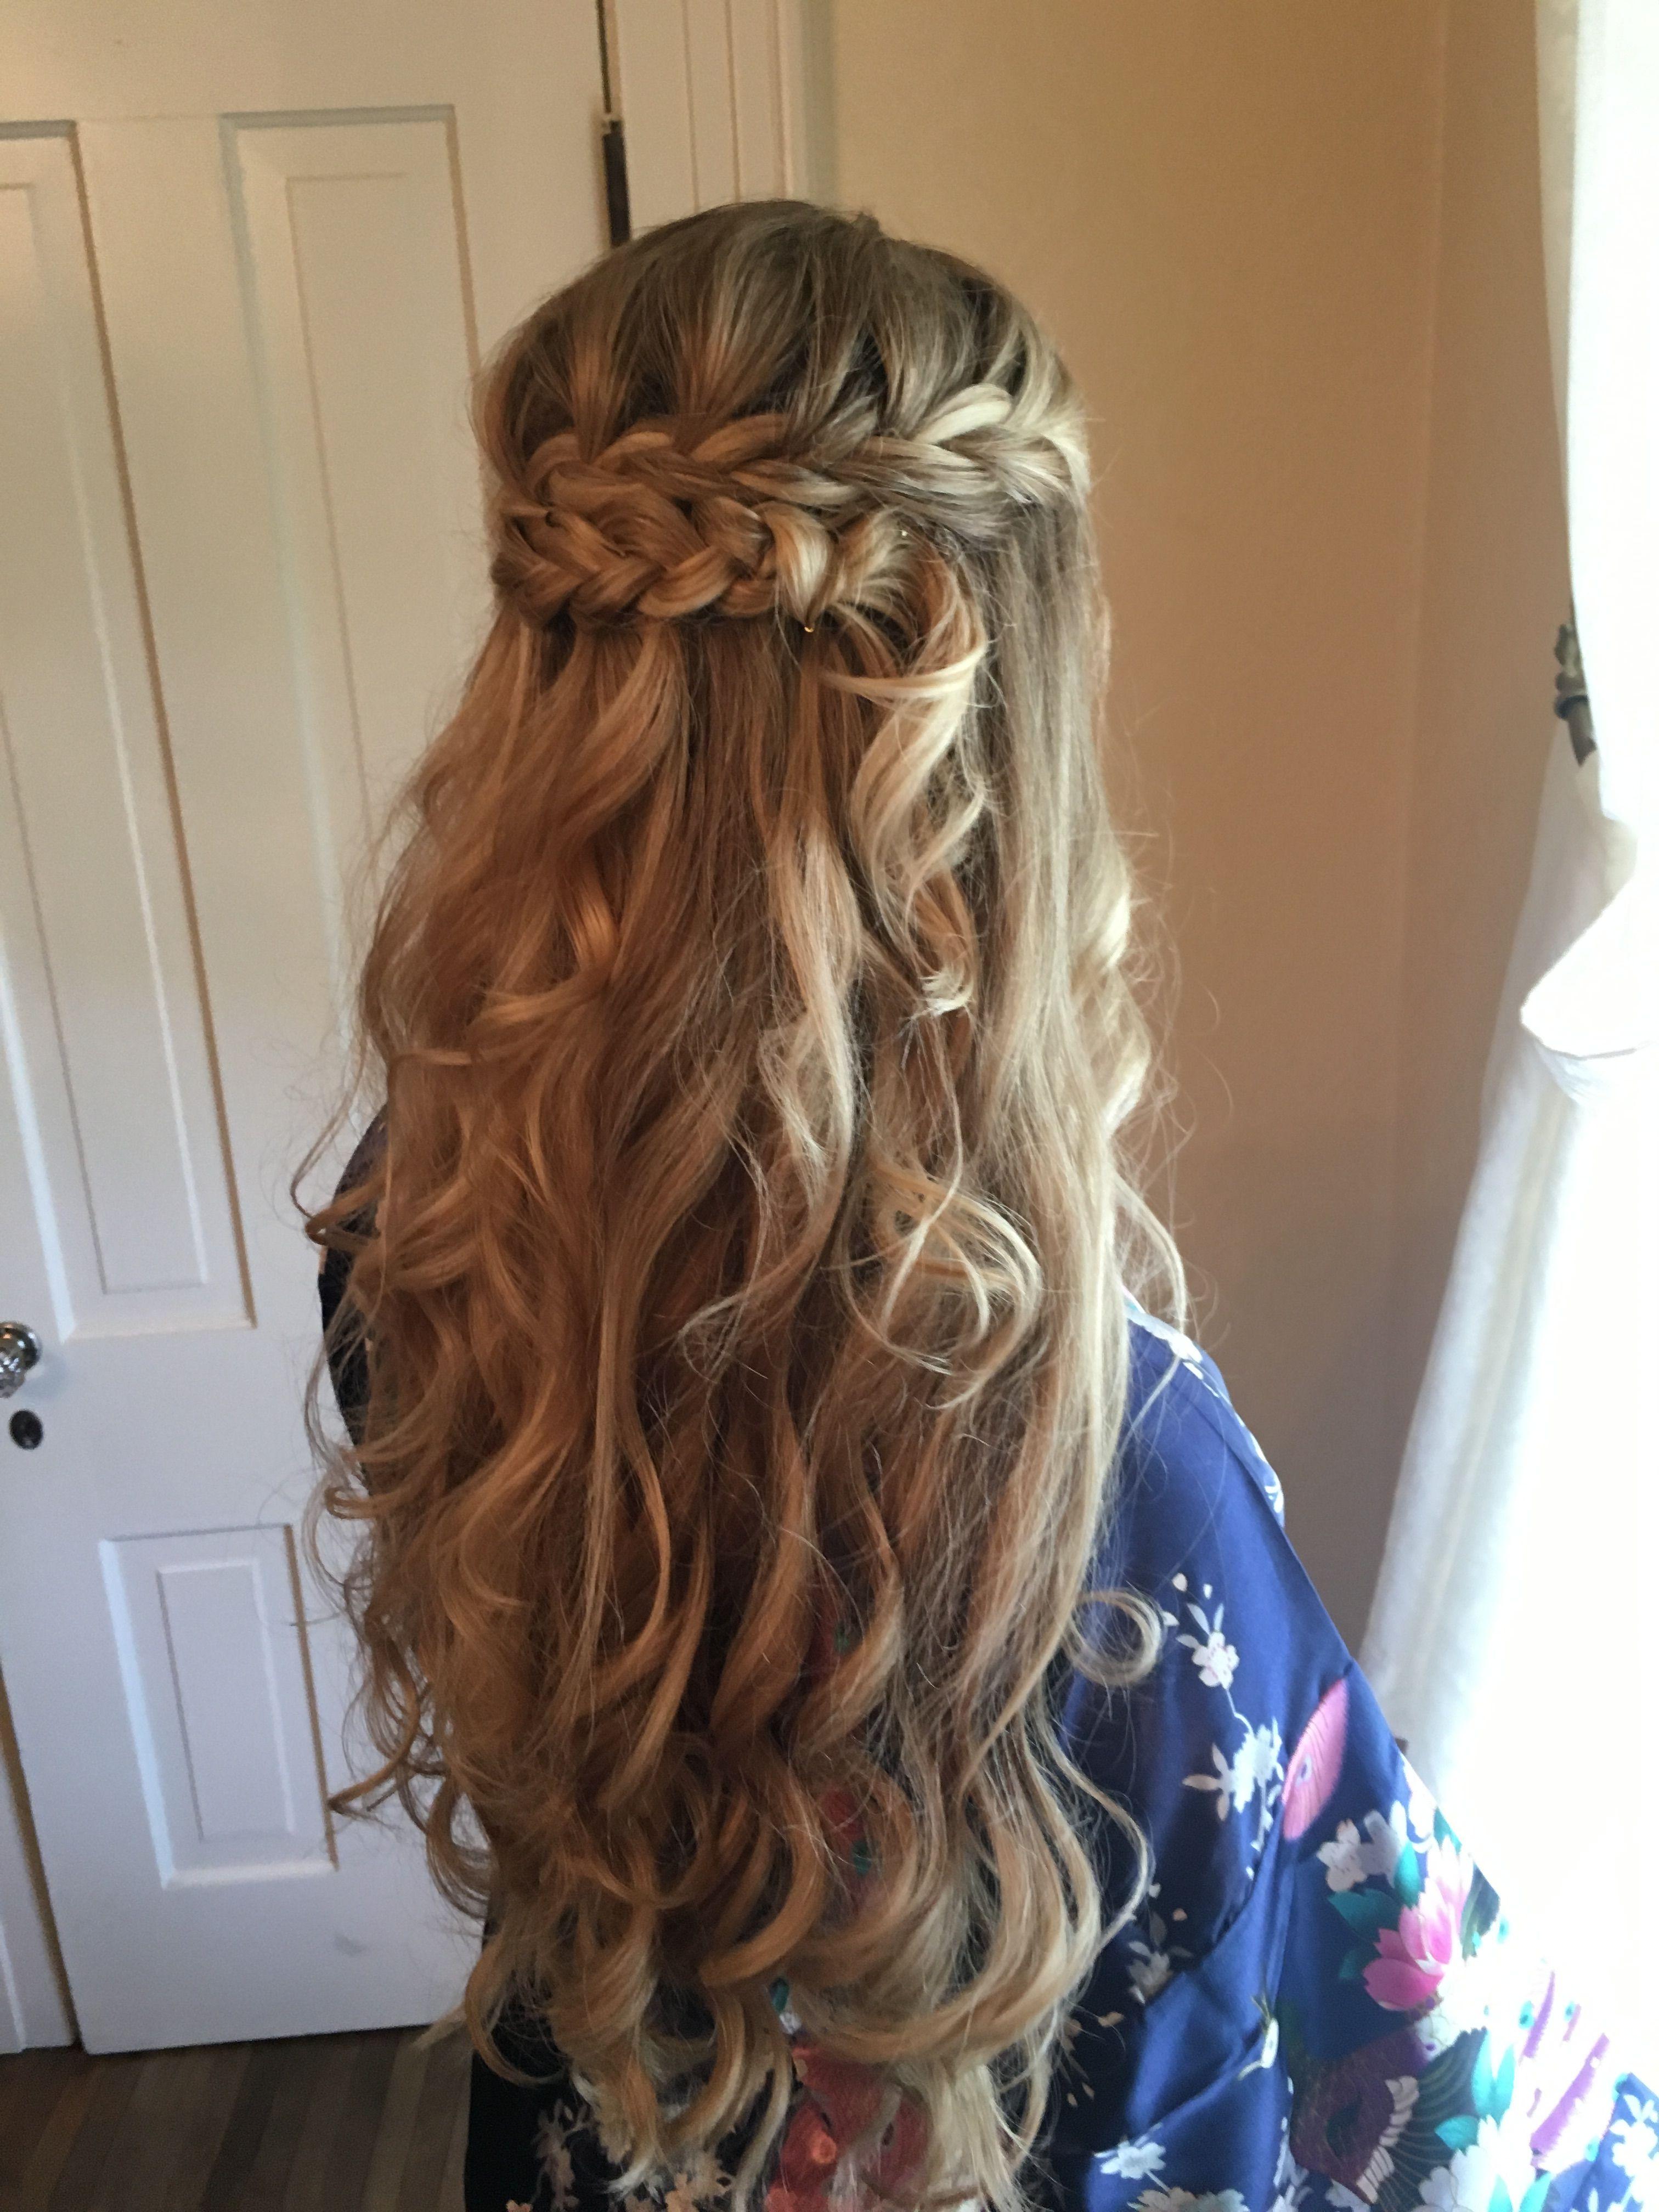 Half up half down up do braid curls wedding hairstyles long hair